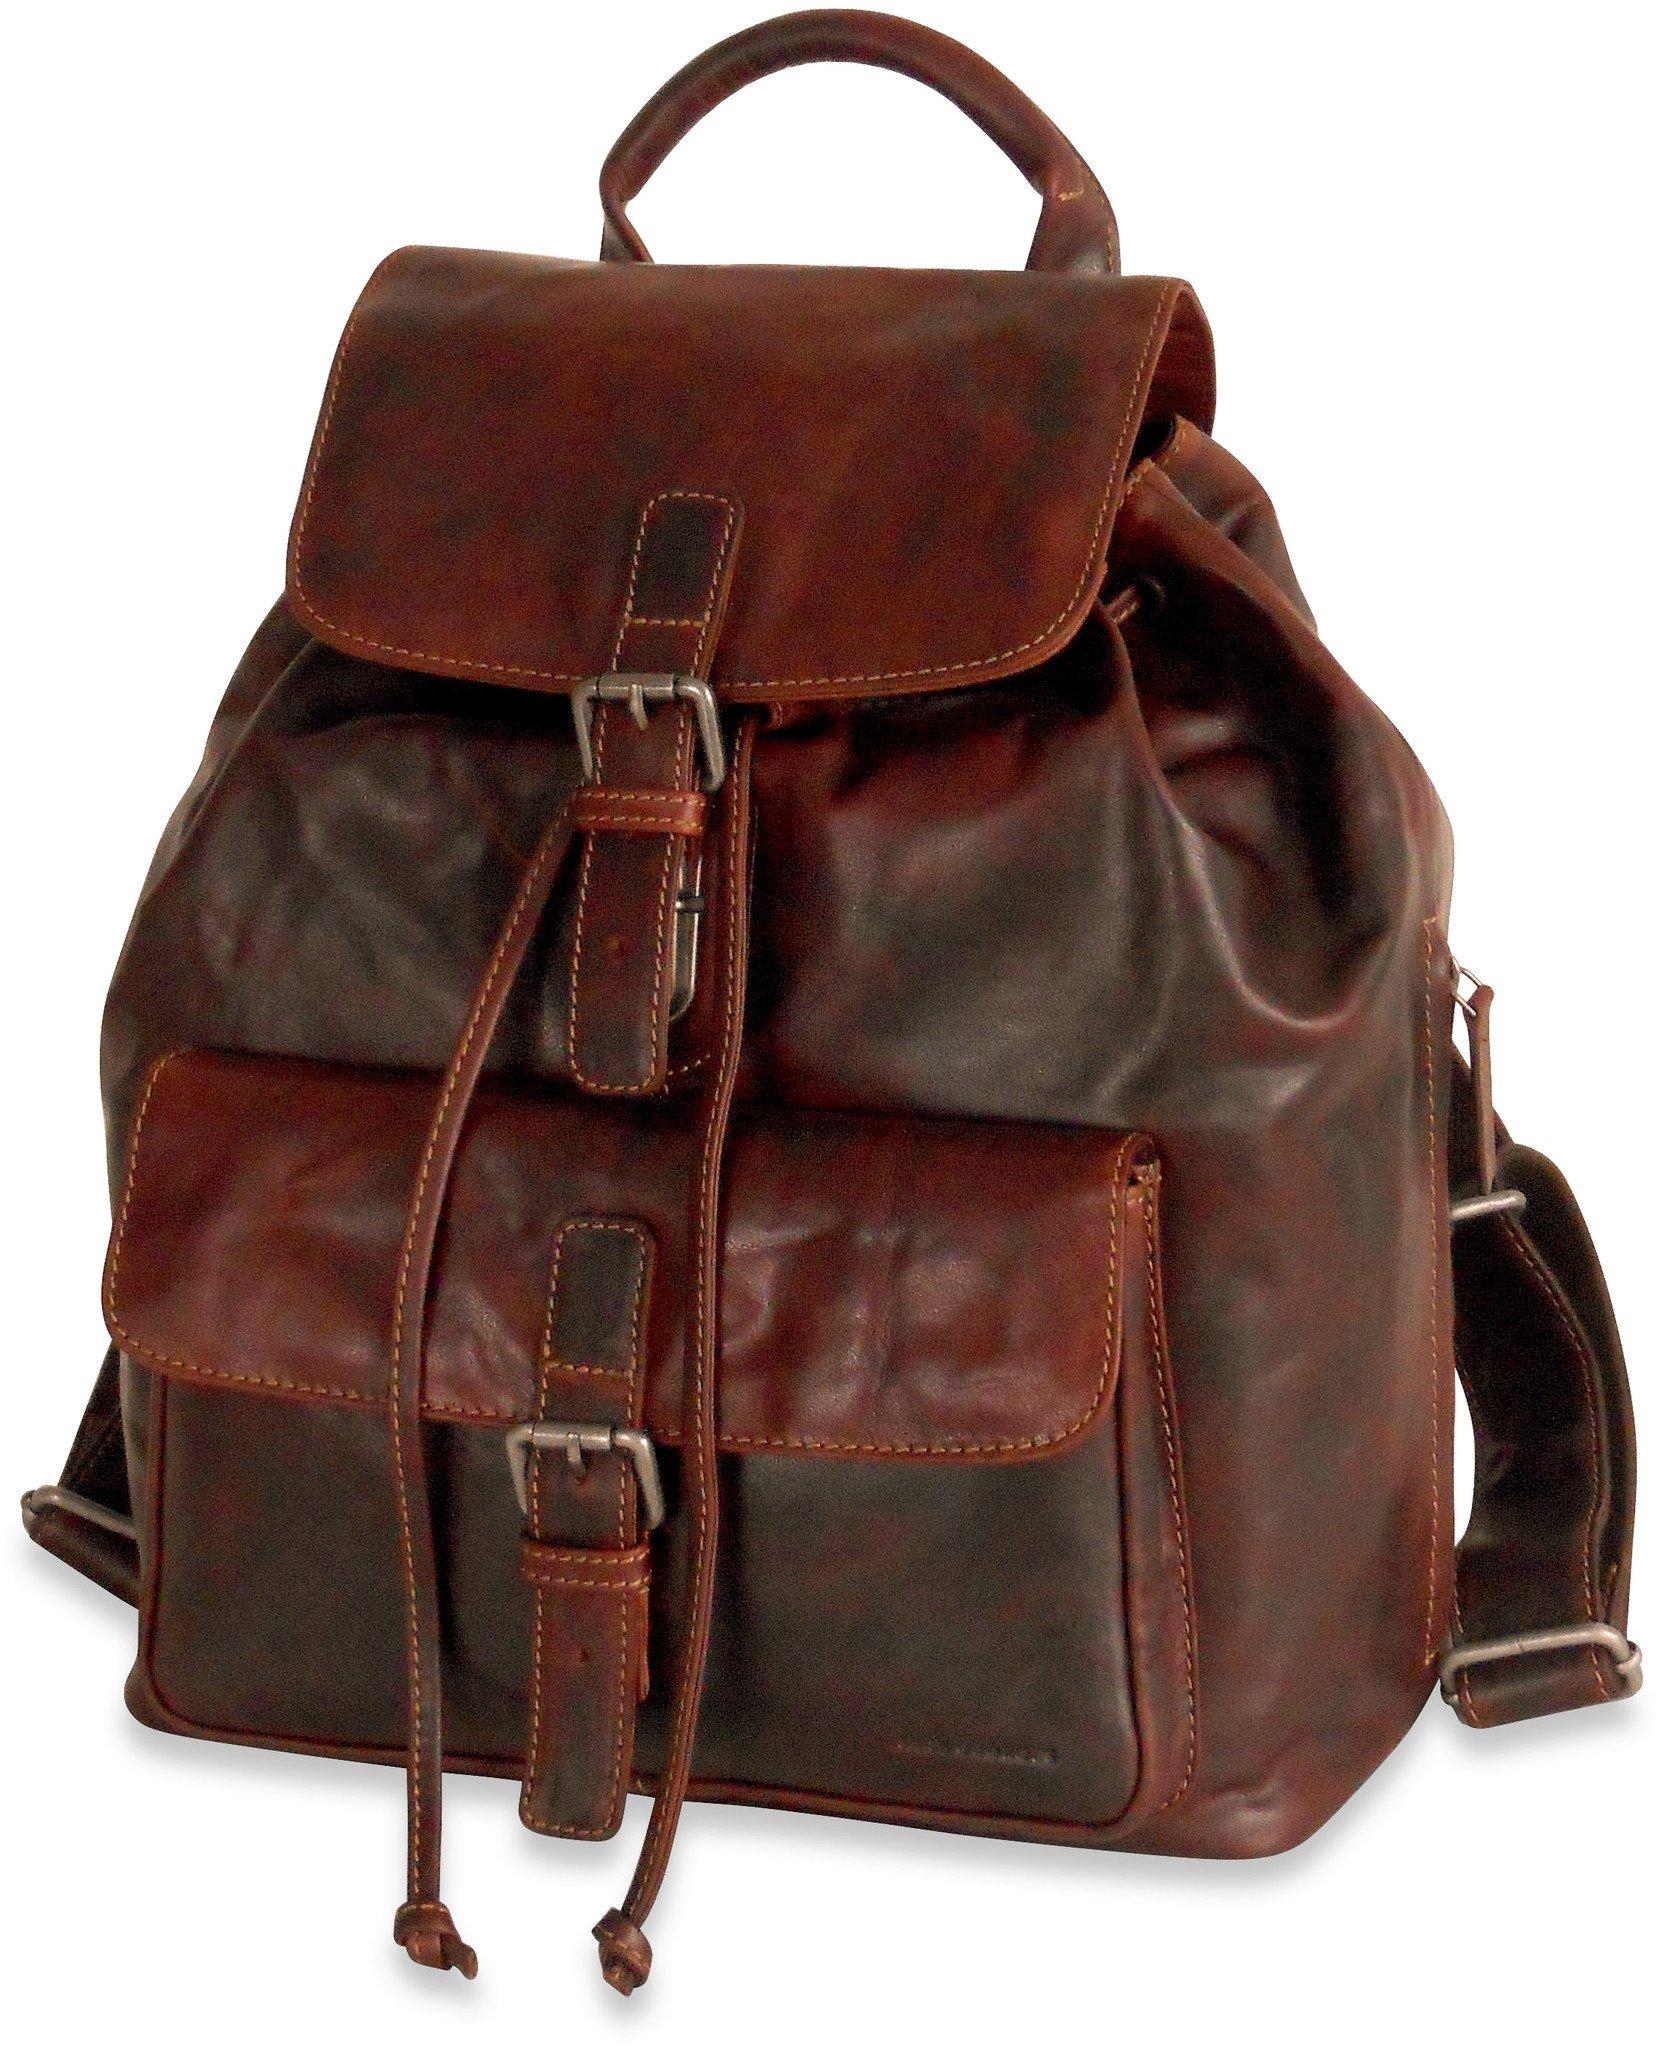 Jack Georges Voyager Drawstring Backpack - Brown